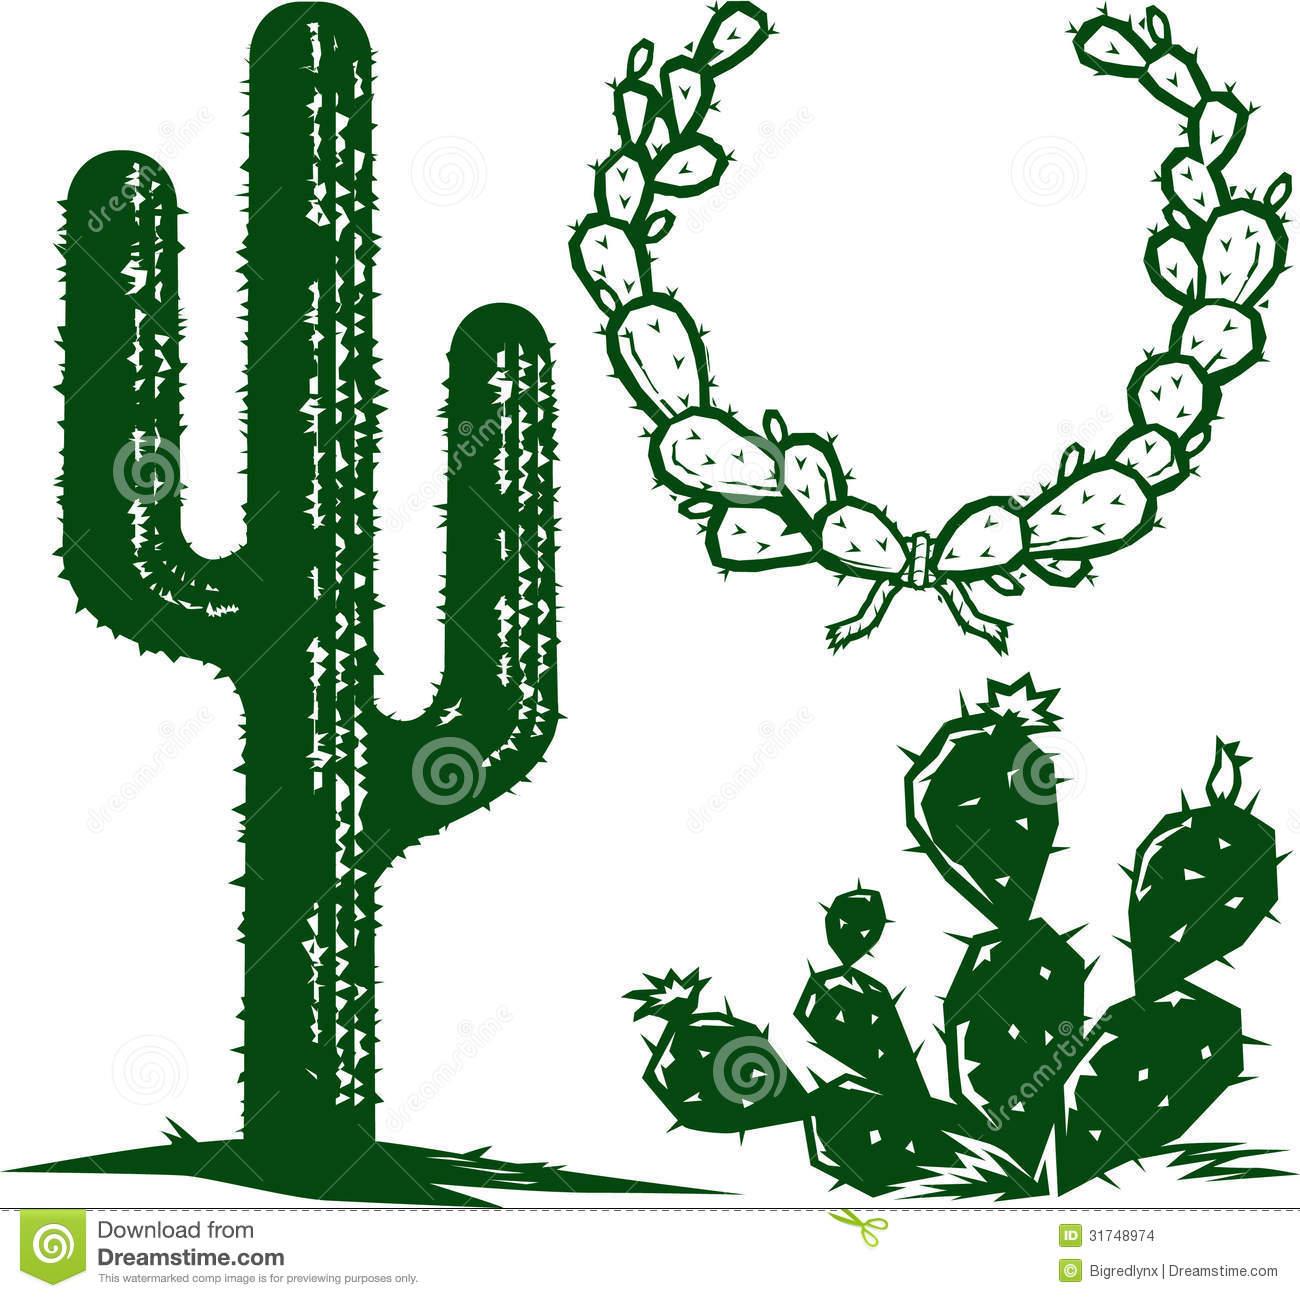 Cactus clipart - Clipground